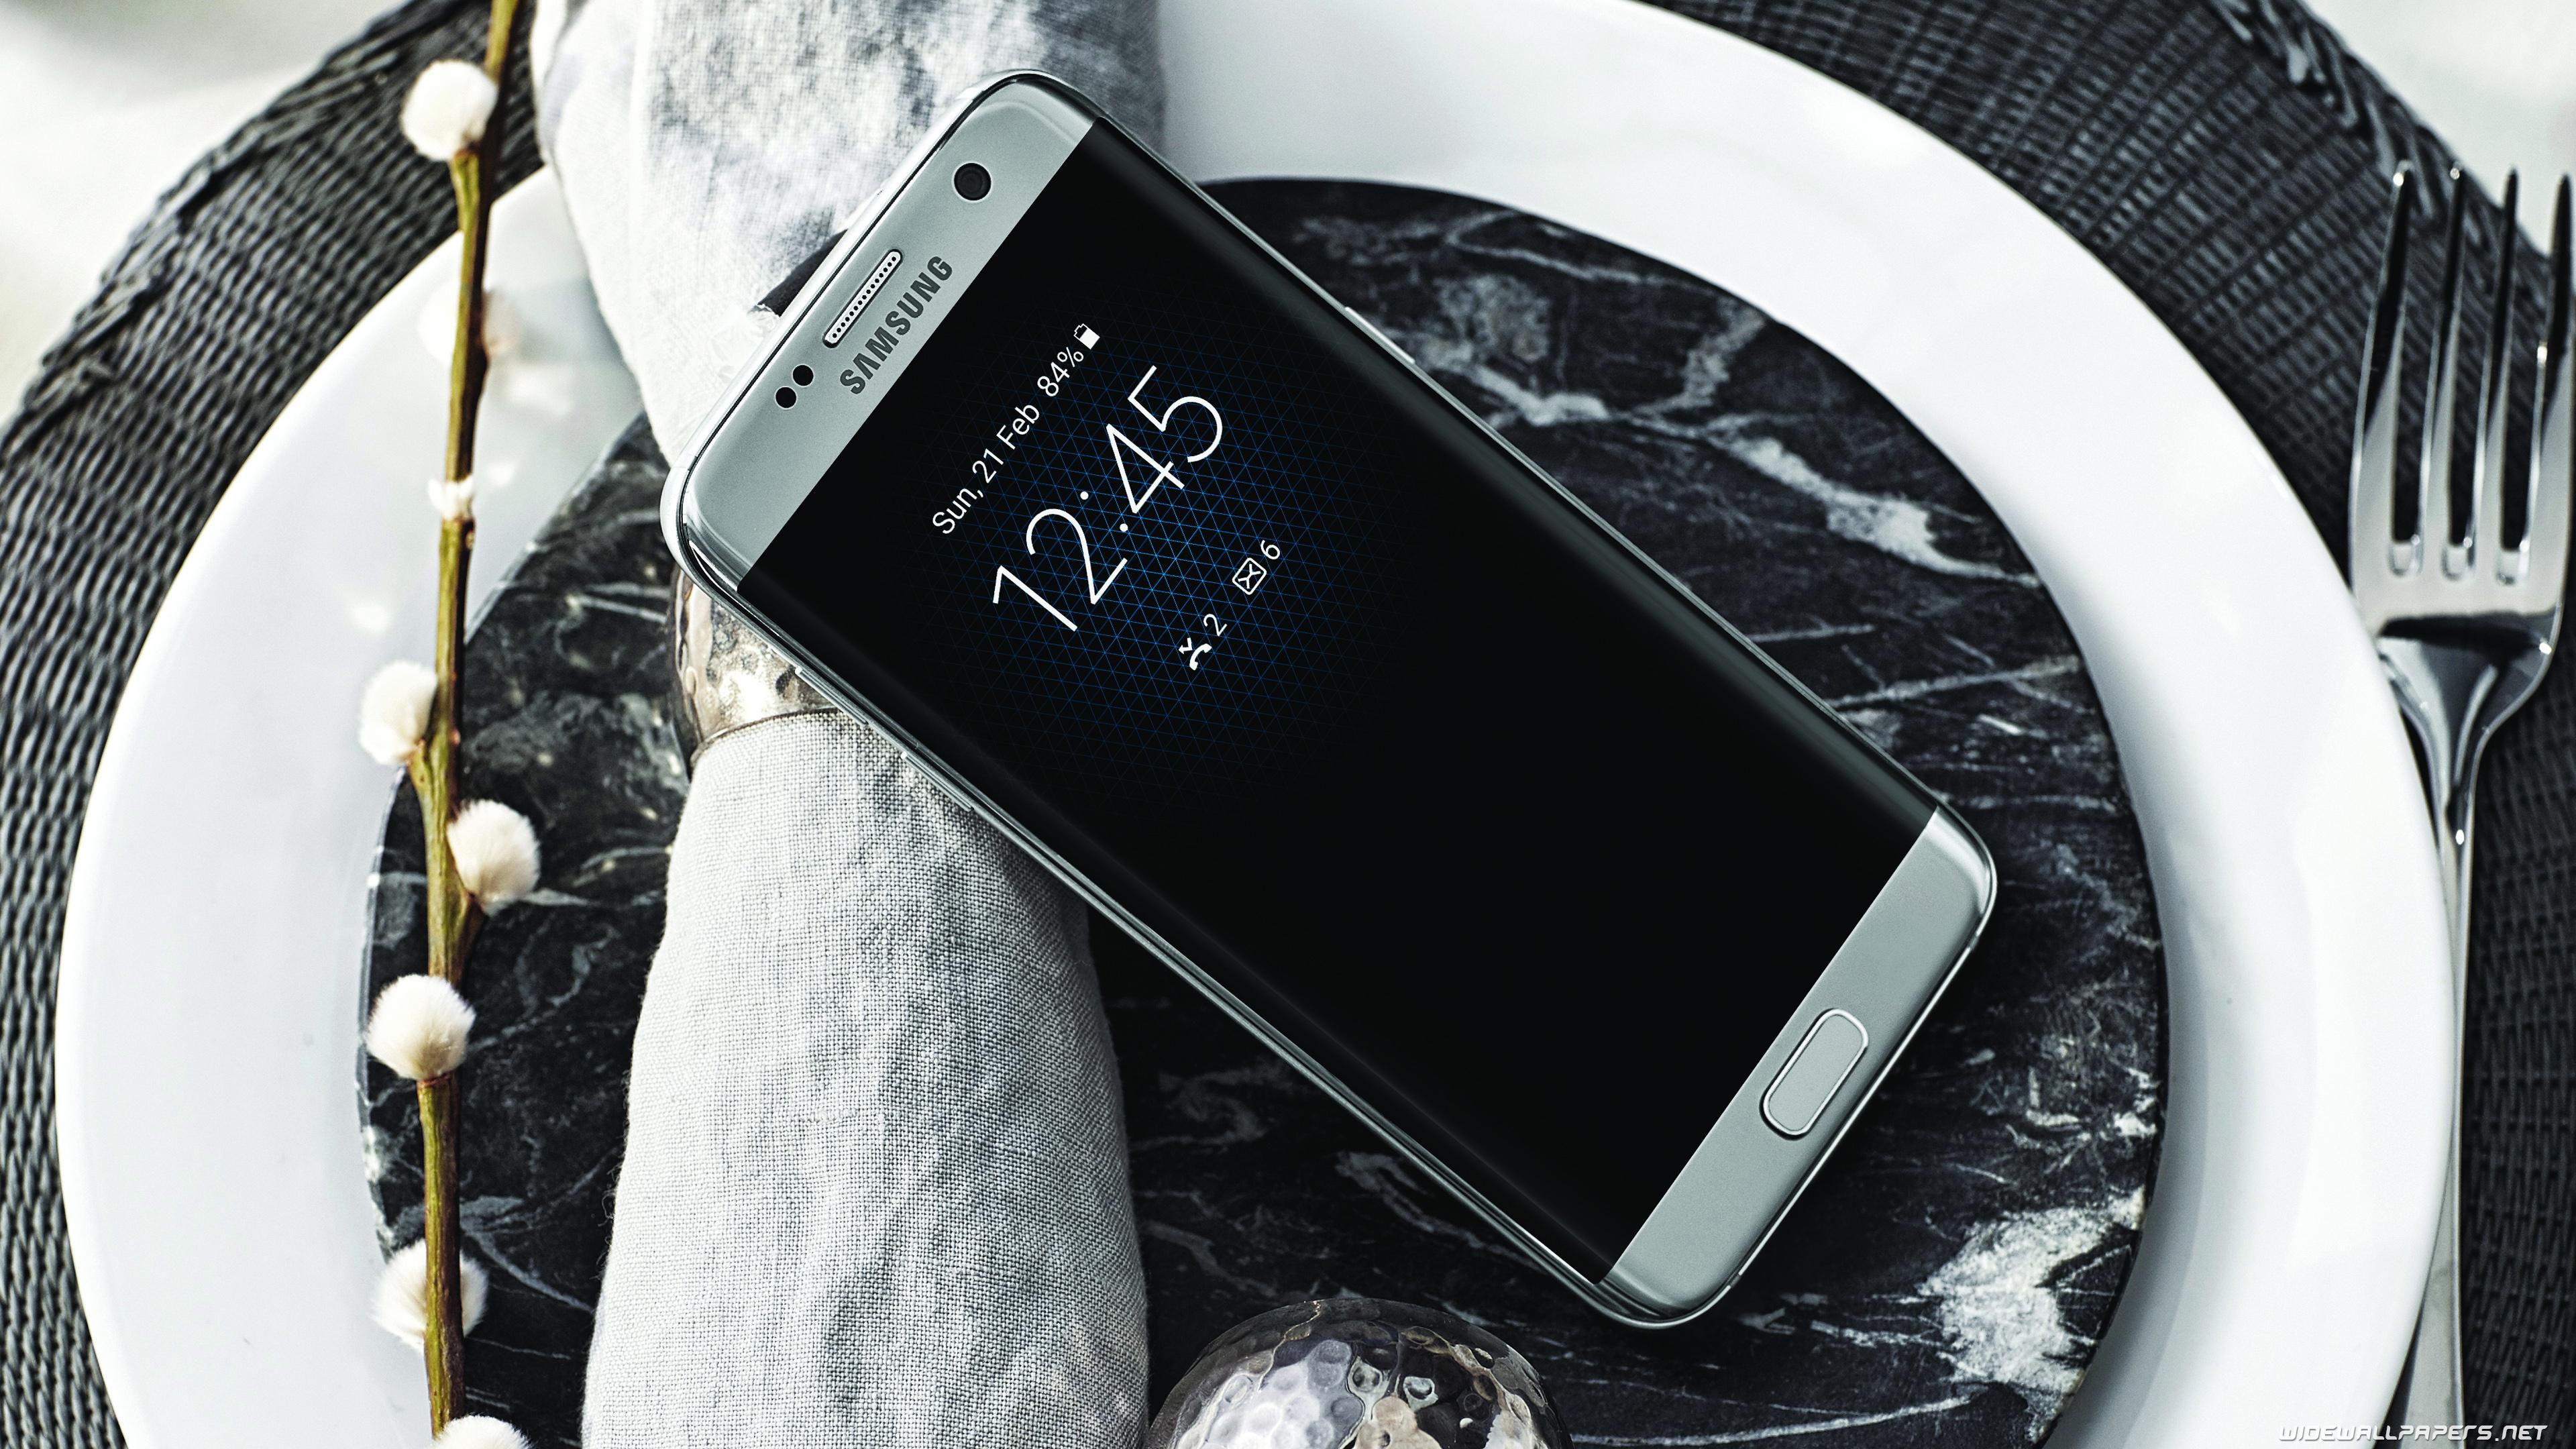 Samsung Galaxy S7 Edge Beautiful 3840x2160 Wallpaper Teahub Io